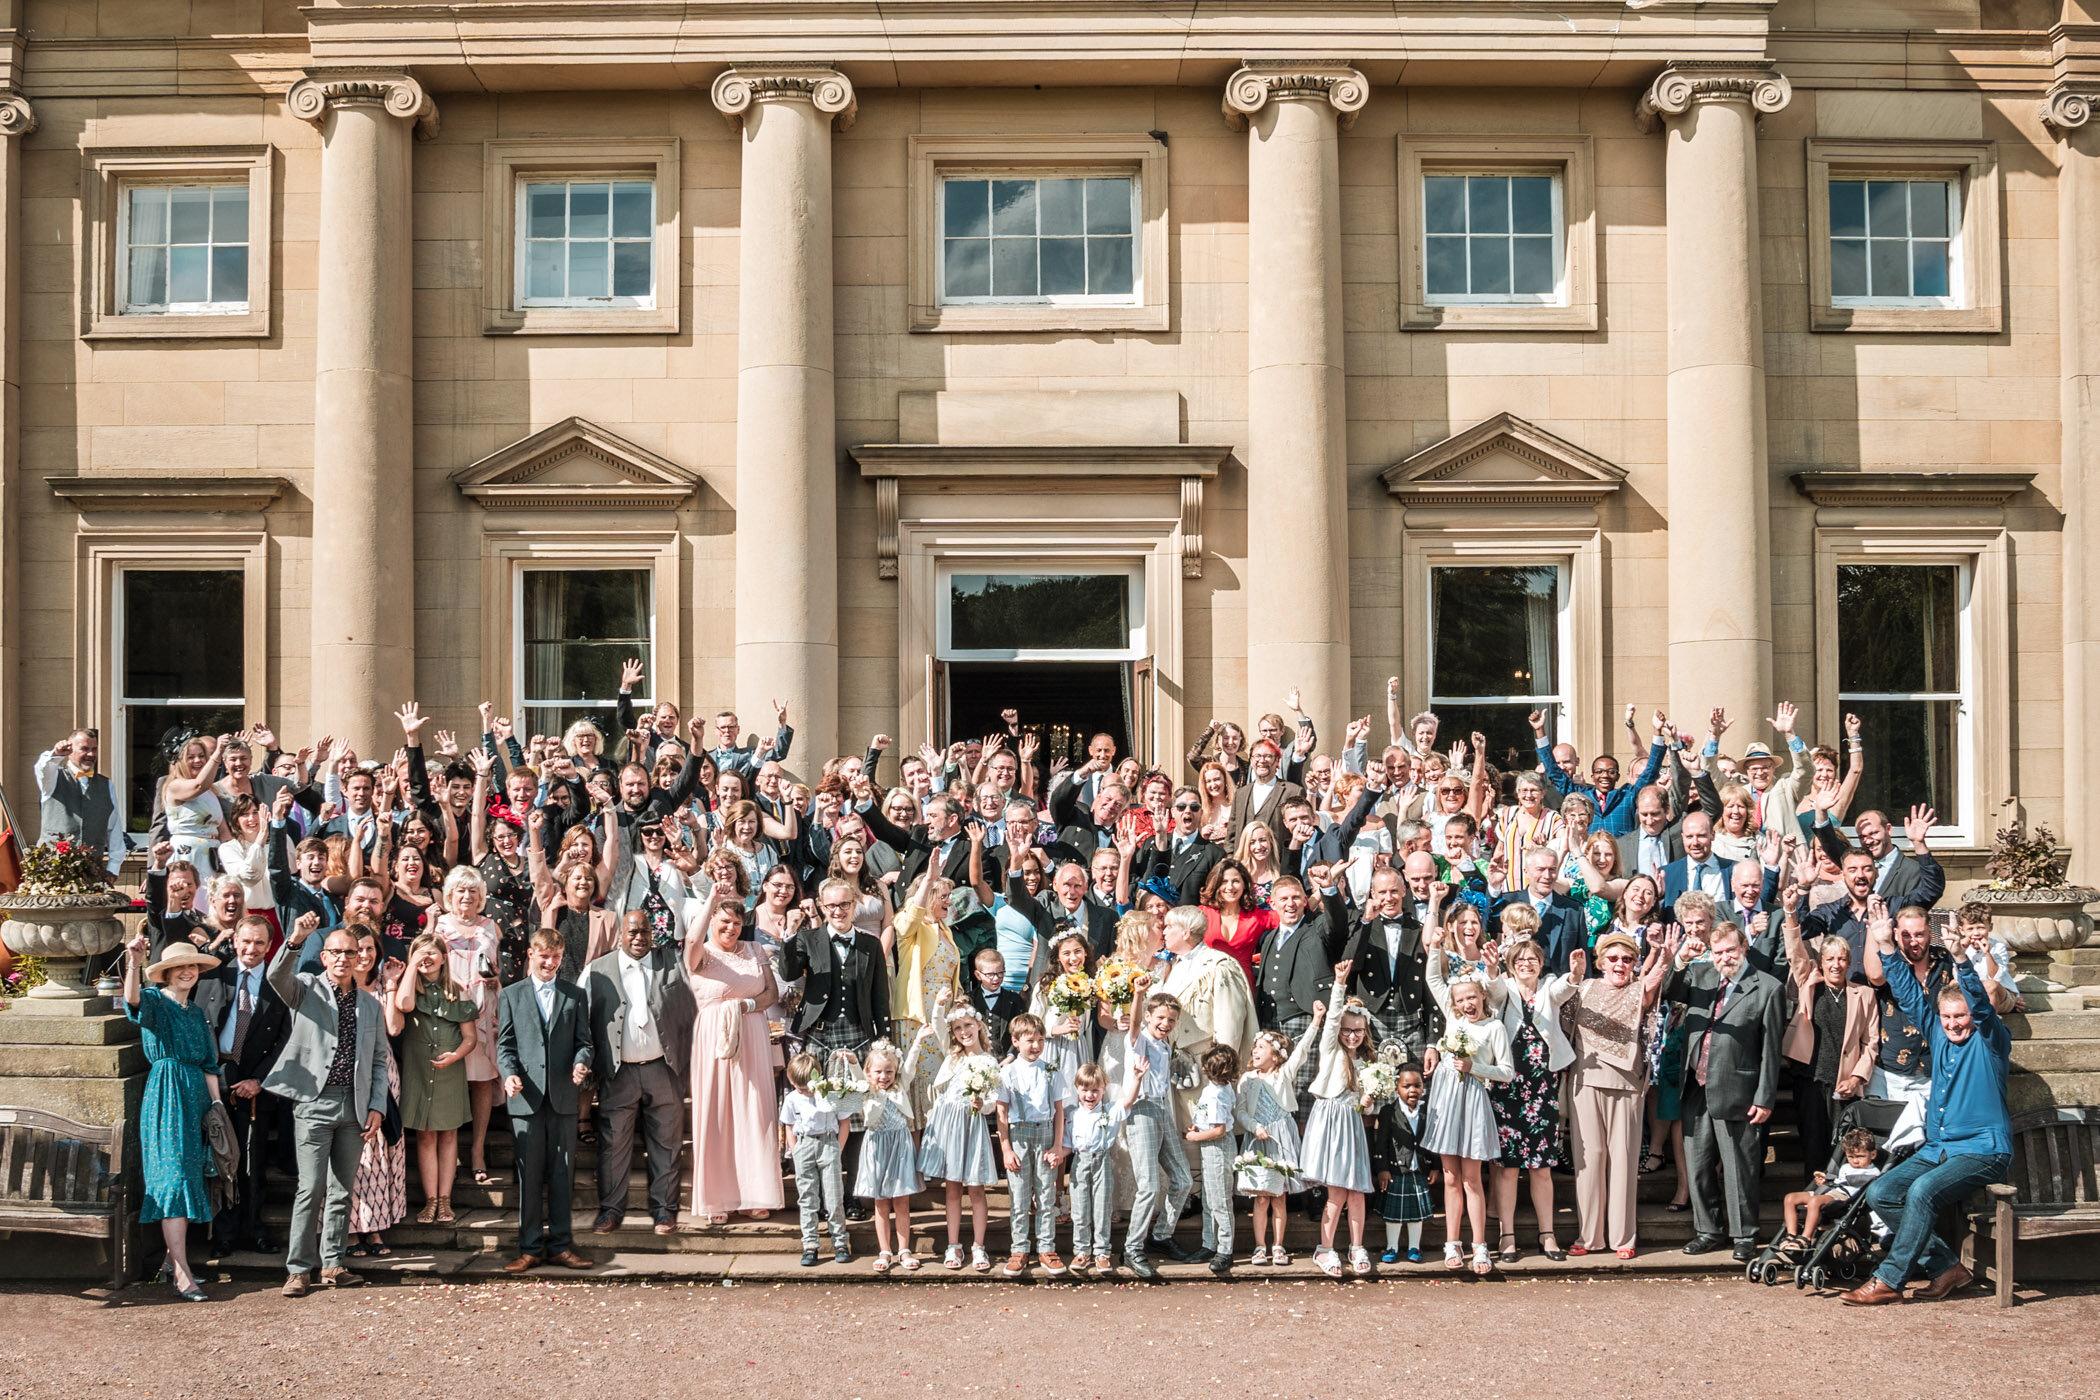 wortley_hall_summer_brides_scottish_brides_wedding_photographer_photography_brides_beautiful_scotish